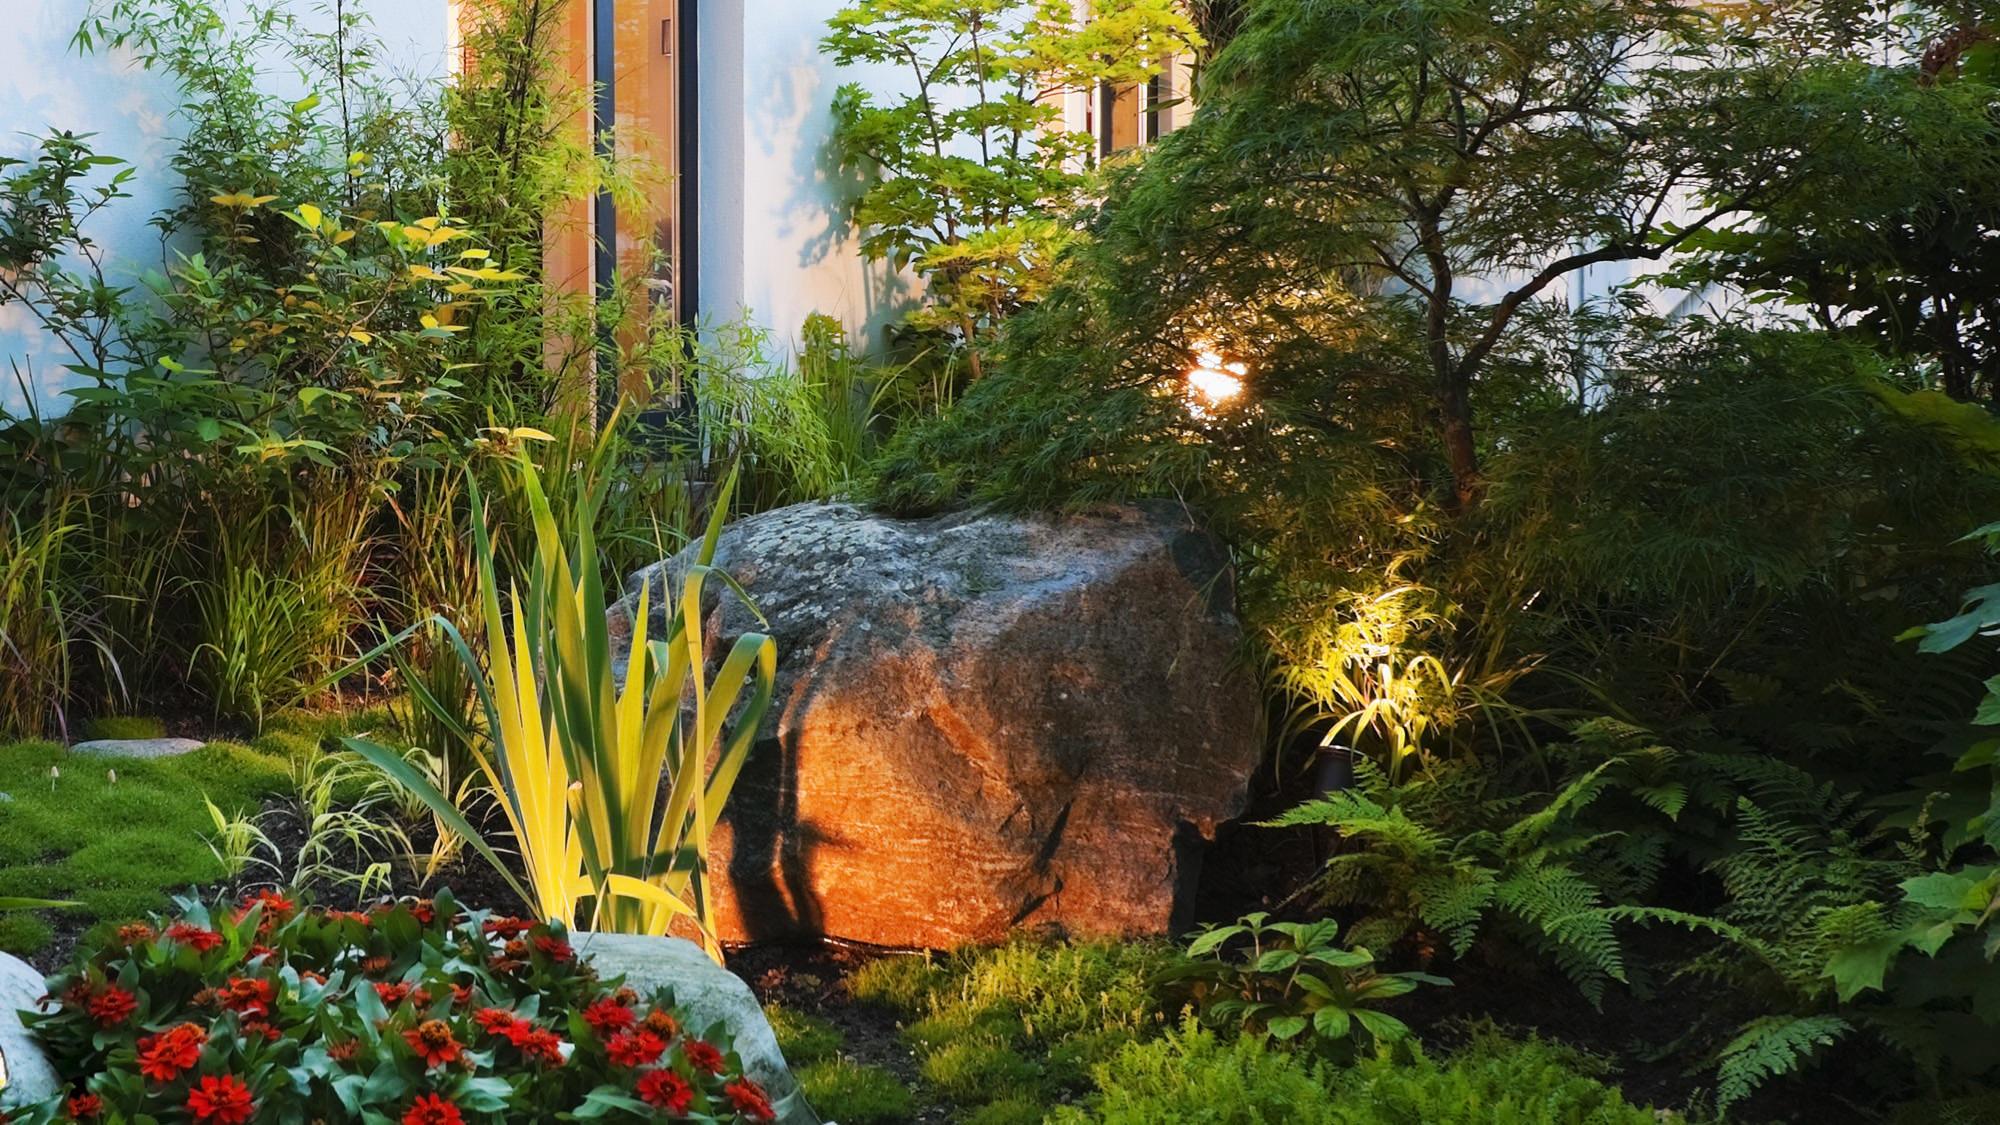 Heike_Bogatzki_modernes_Gartendesign_Potsdam_Berlin.jpg